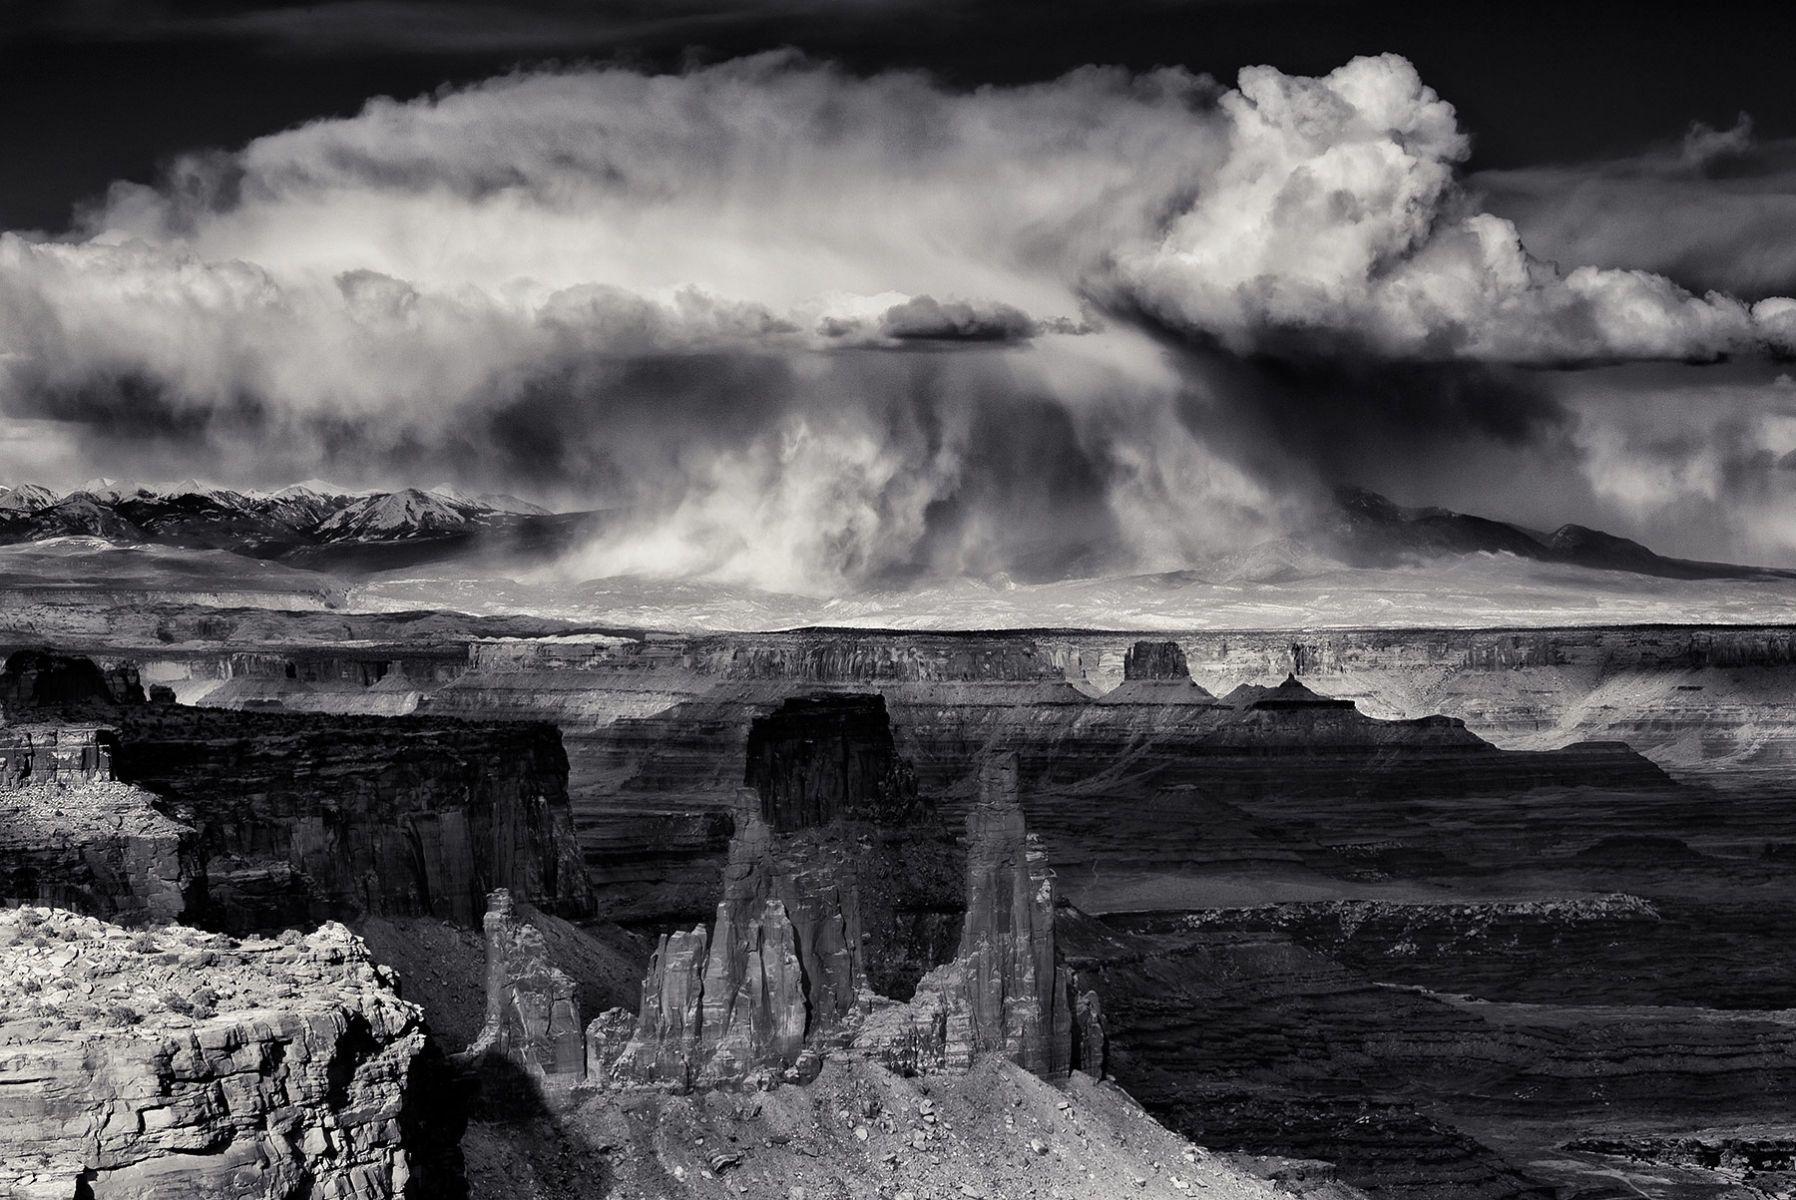 Snowstorm over the La Sal Mountains, Utah